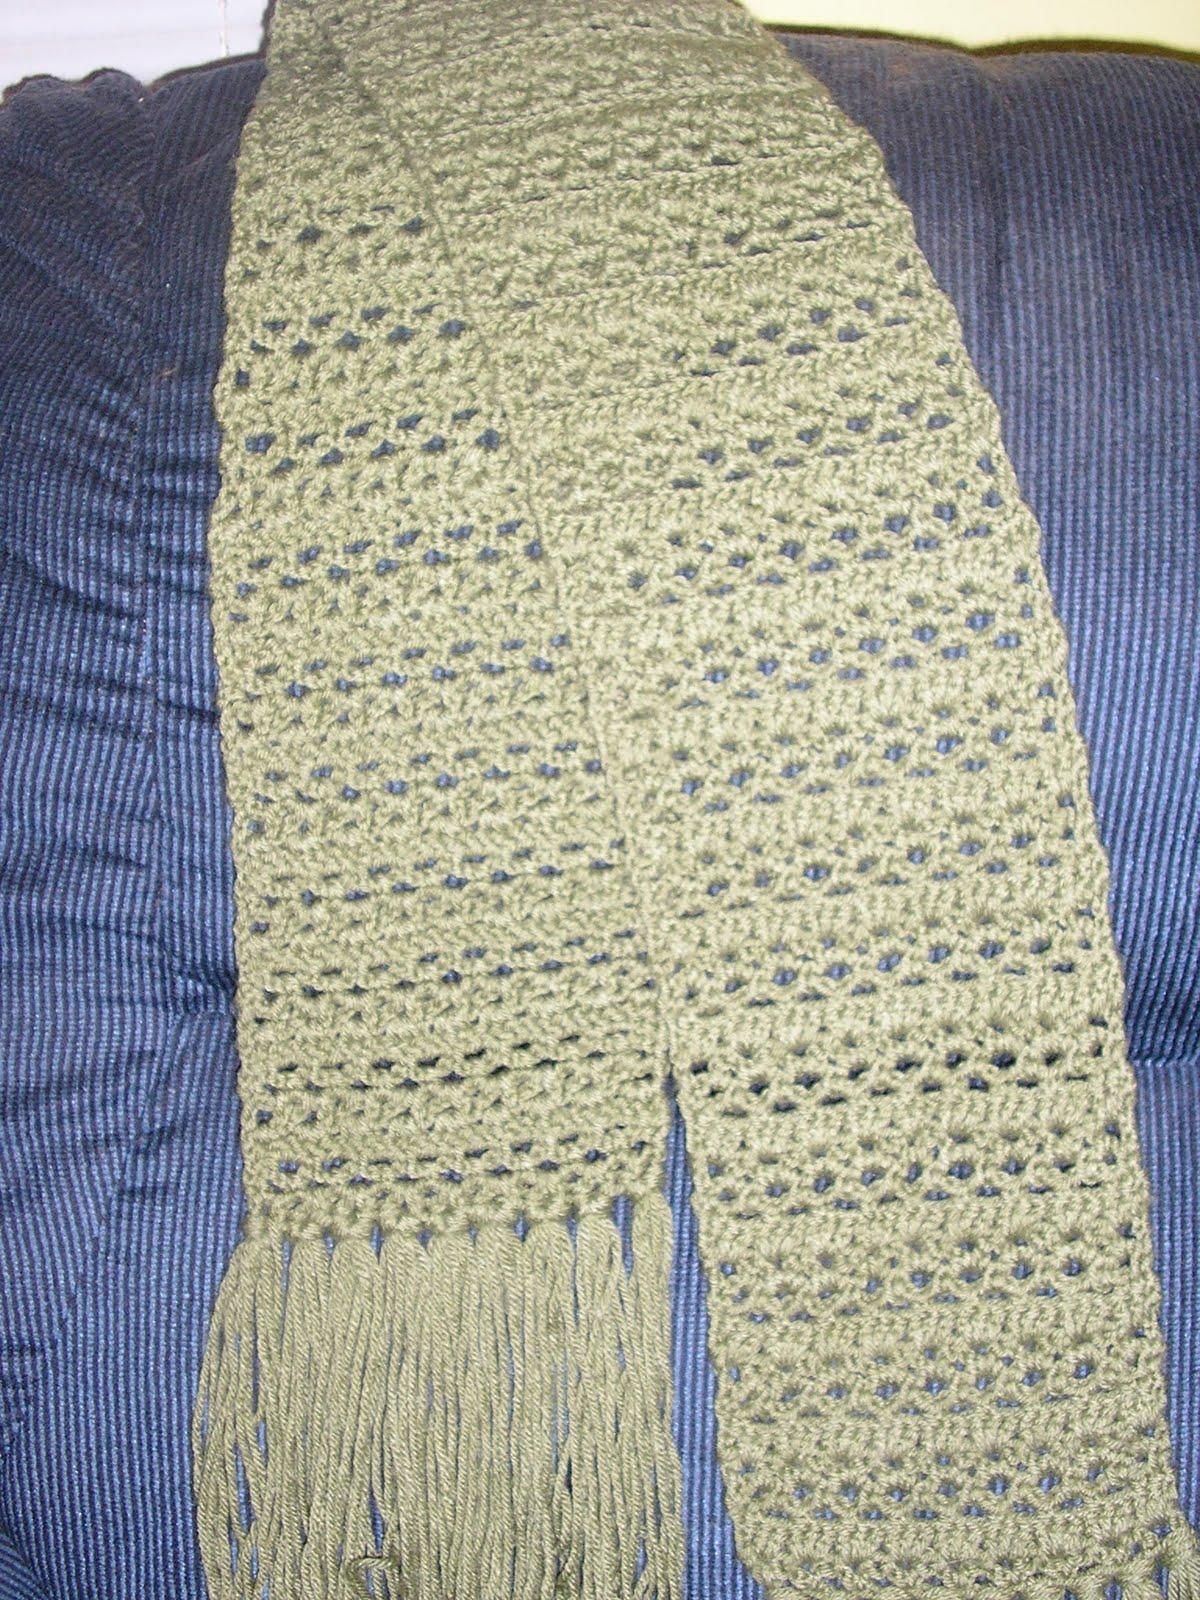 Crochet Daze: Simple Shells & Lace Scarf